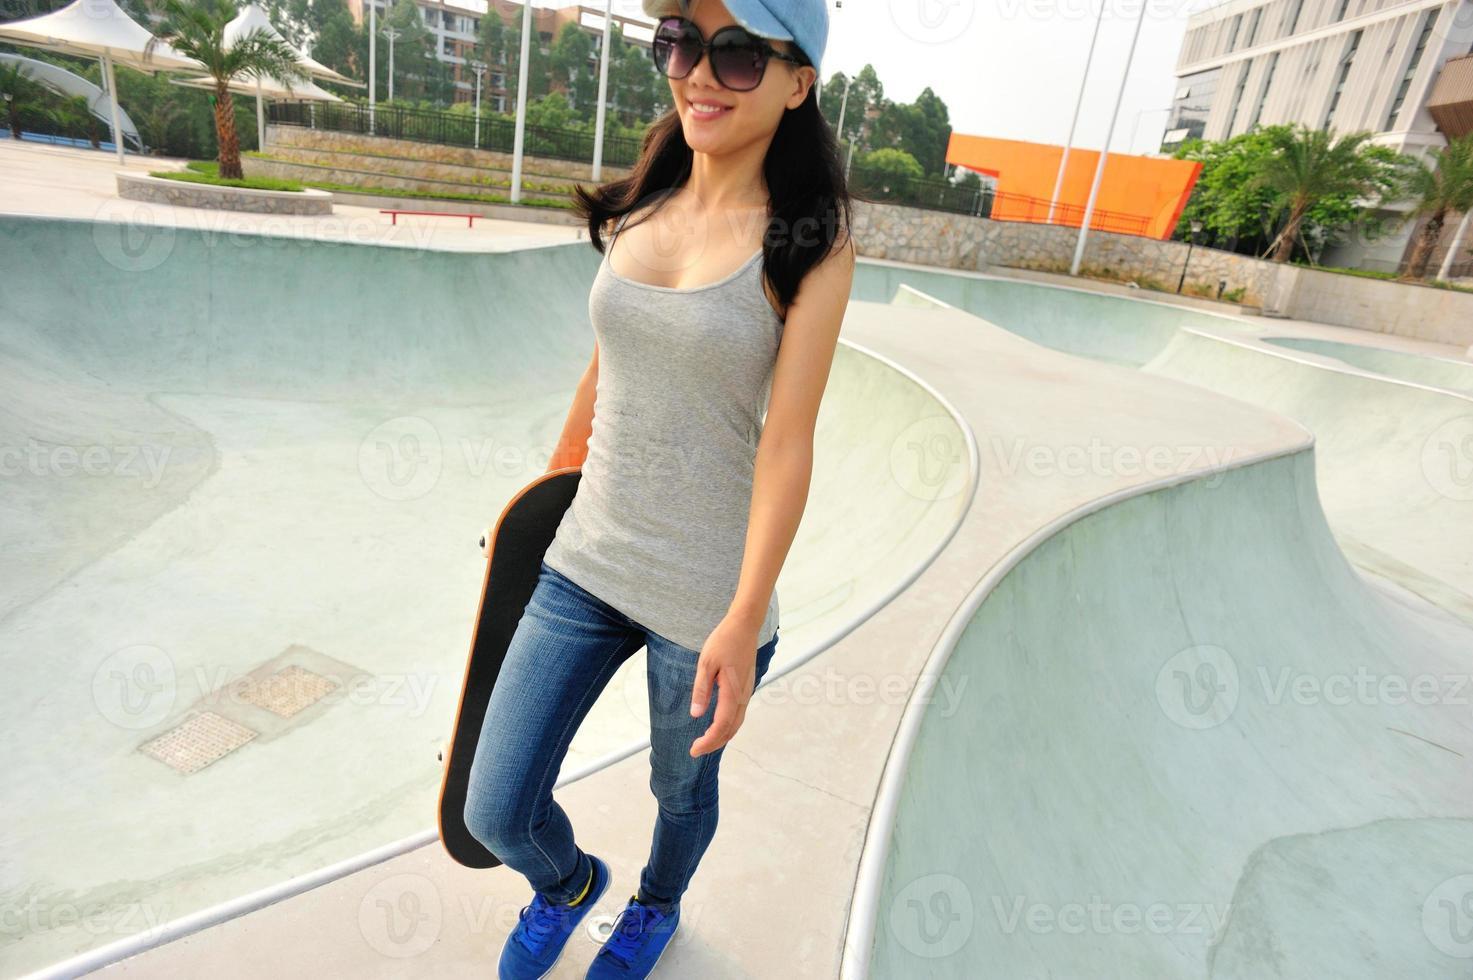 skatista mulher andando no skatepark foto